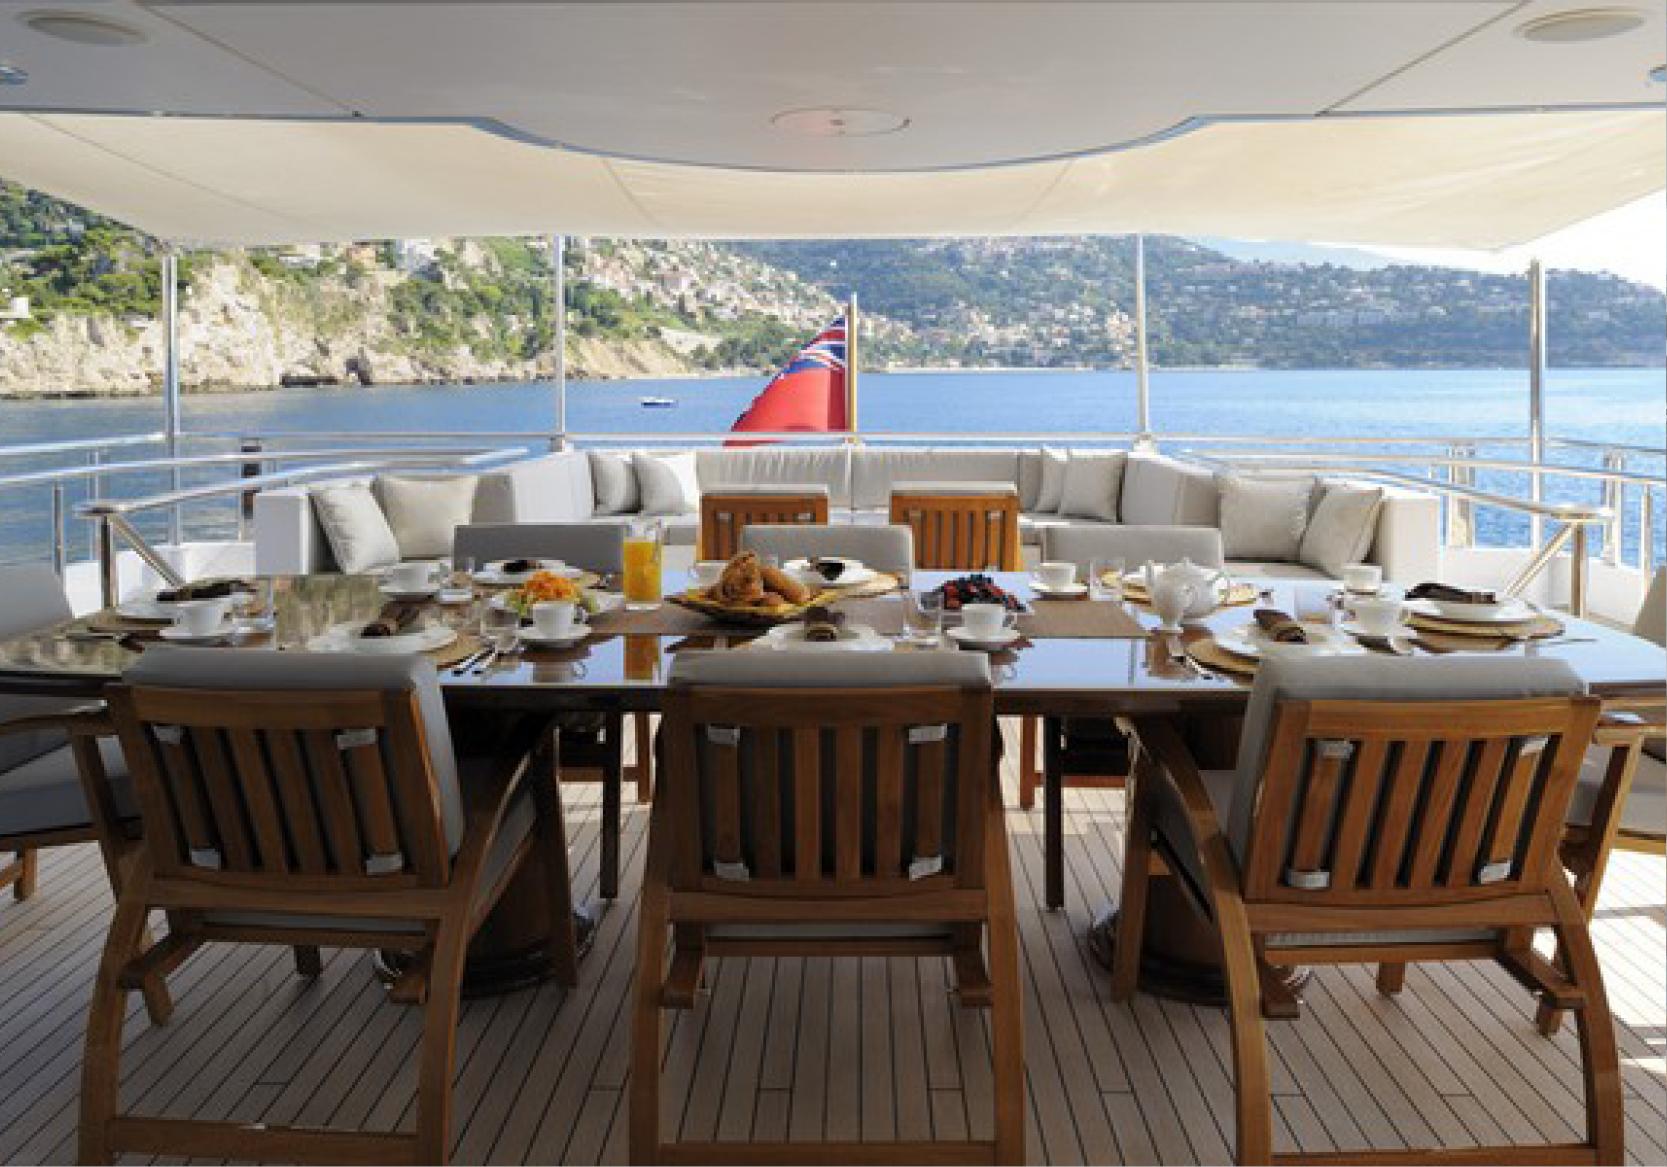 Karen-Lynn-Interior-Design-Yacht-Obsession-9.jpg